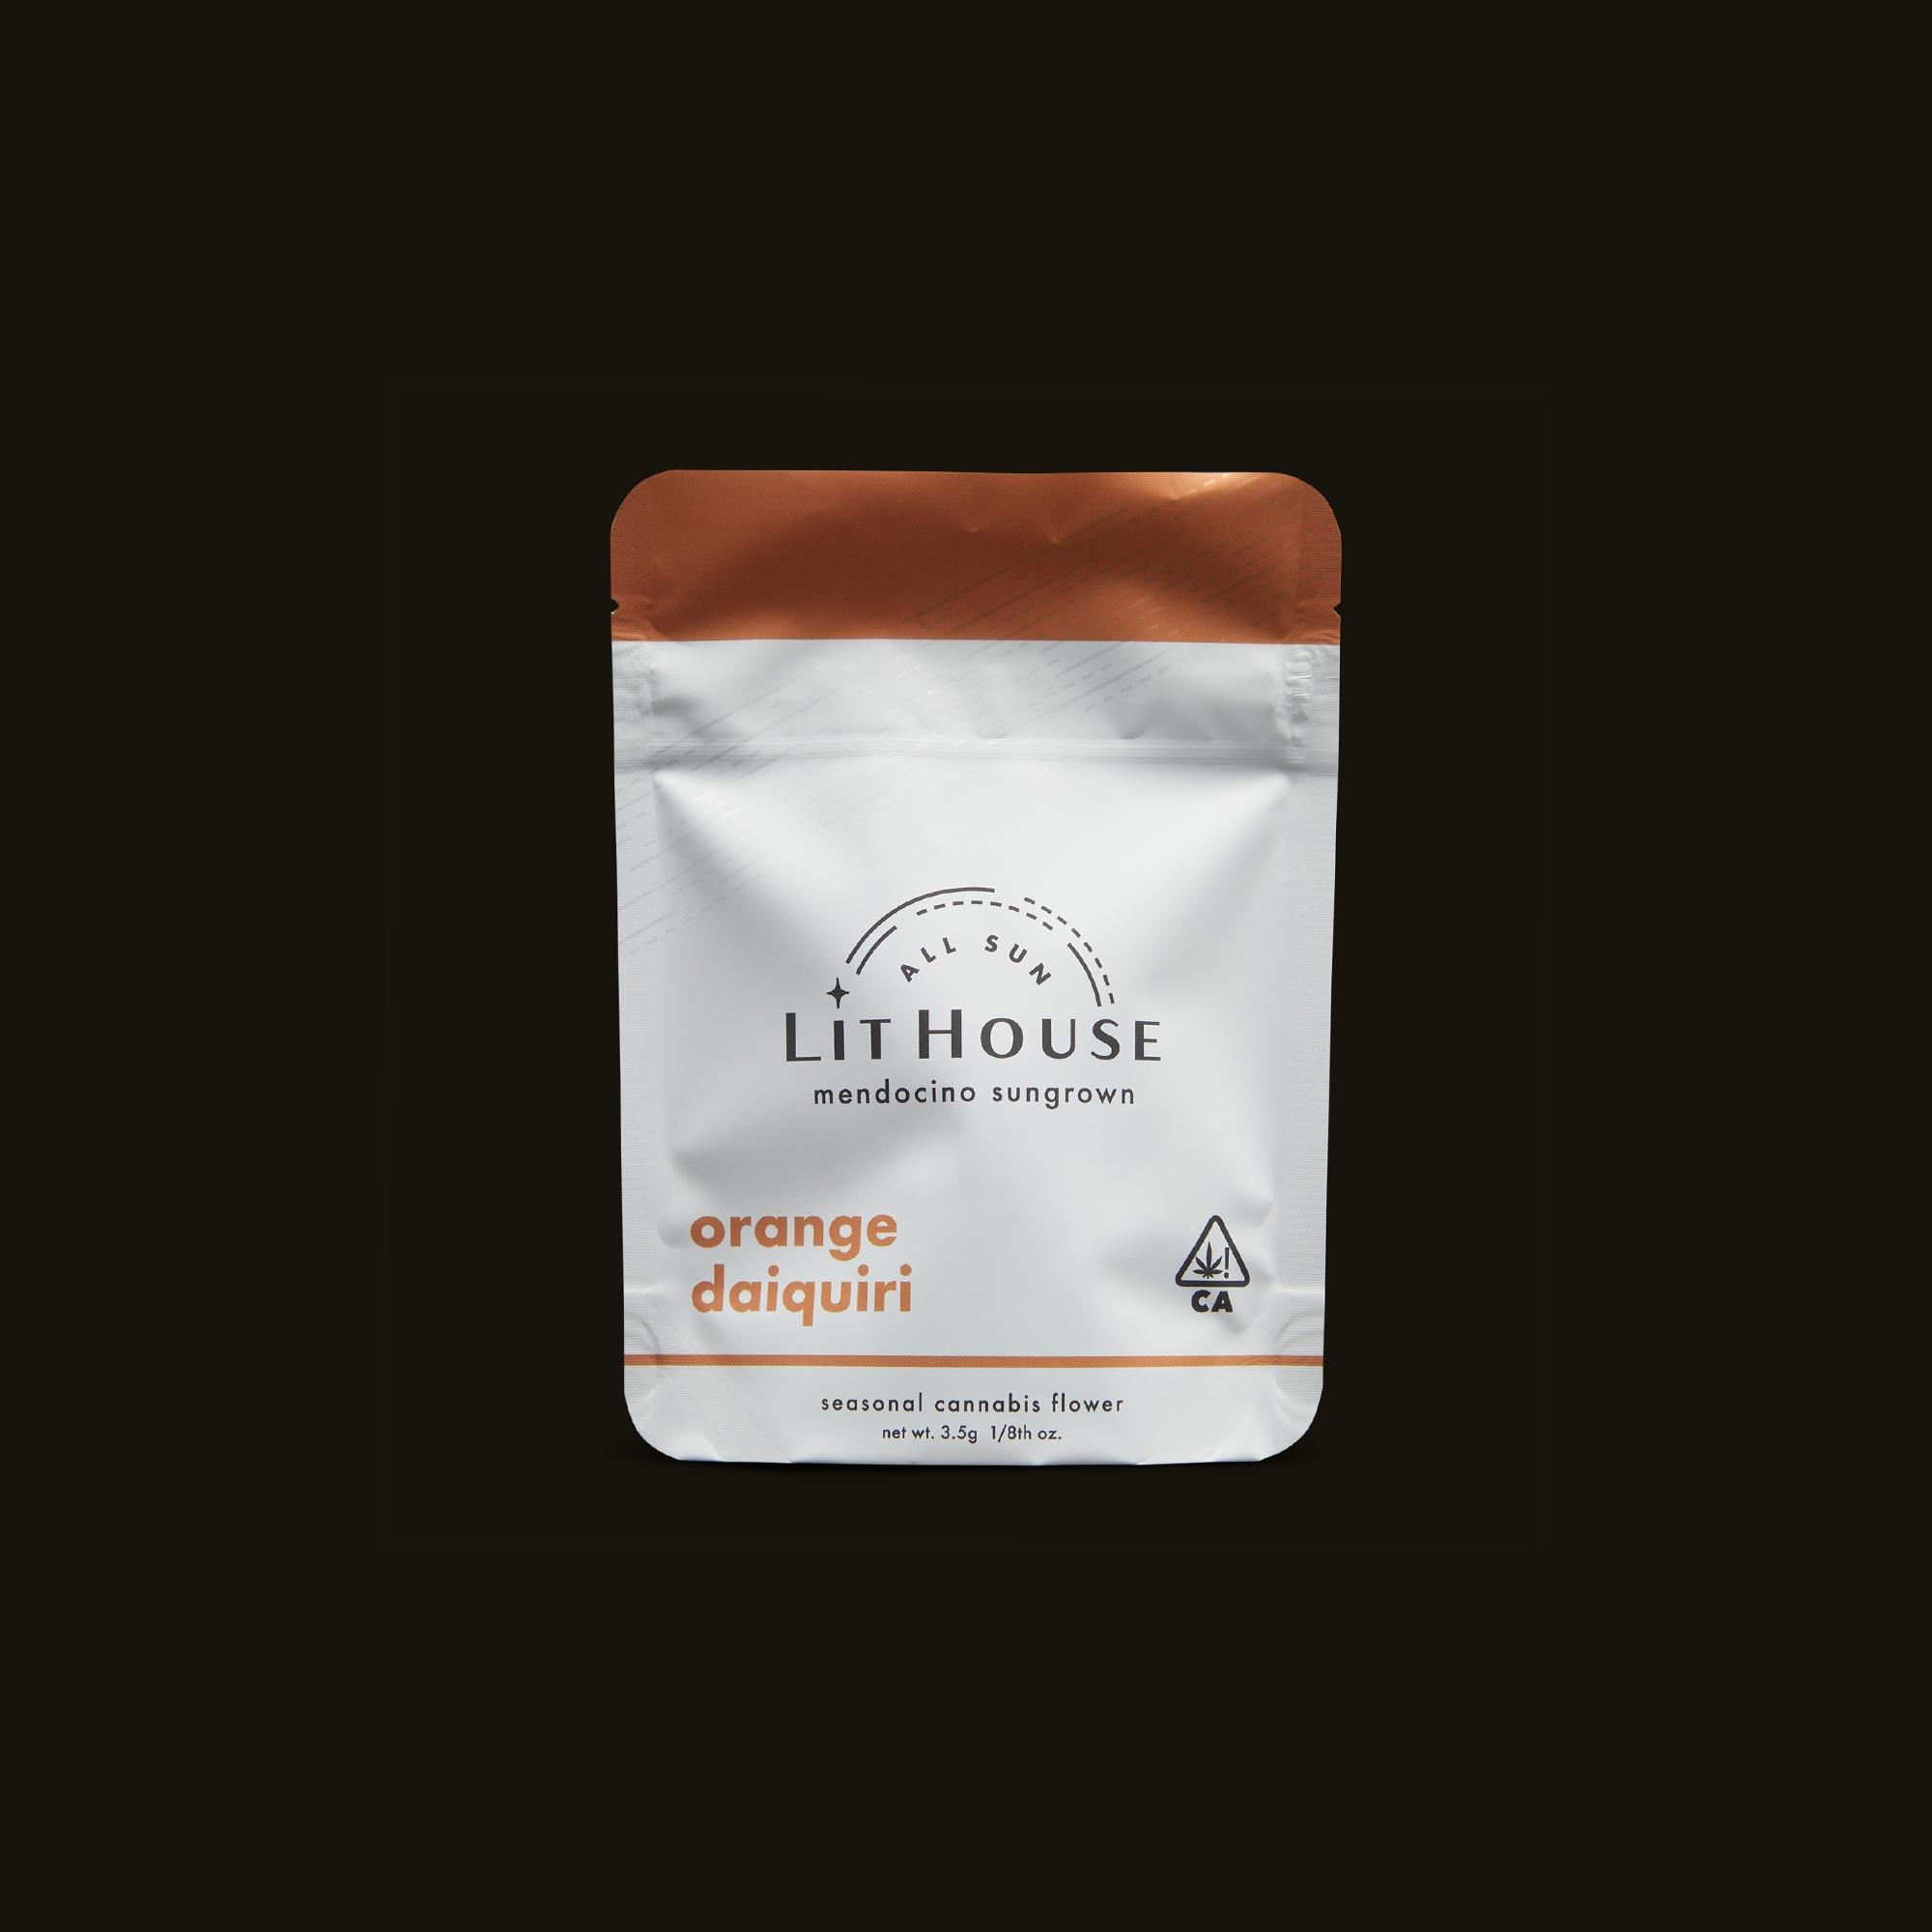 LitHouse All Sun - Orange Daiquiri Front Packaging